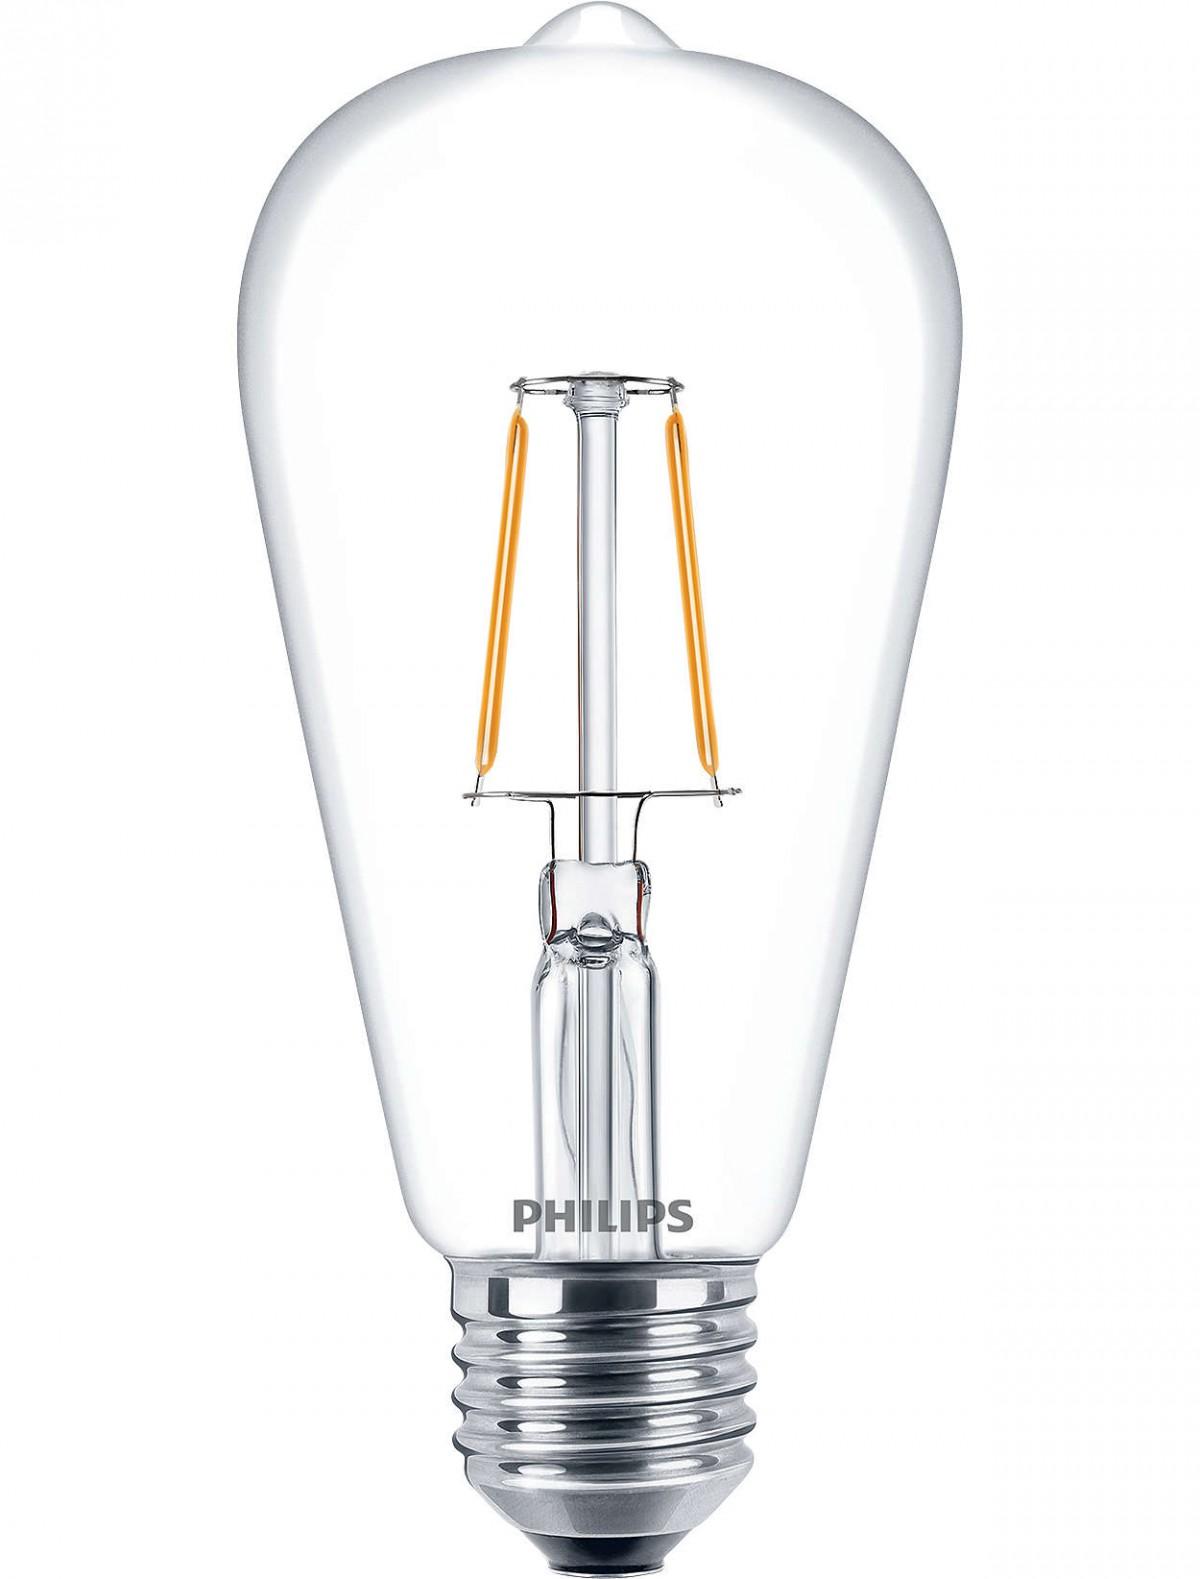 LED žárovka úsporná Philips 4,3W -> ekvivalent 40W E27 - Classic LEDbulb ND 4.3-40W E27 827 ST64 CL